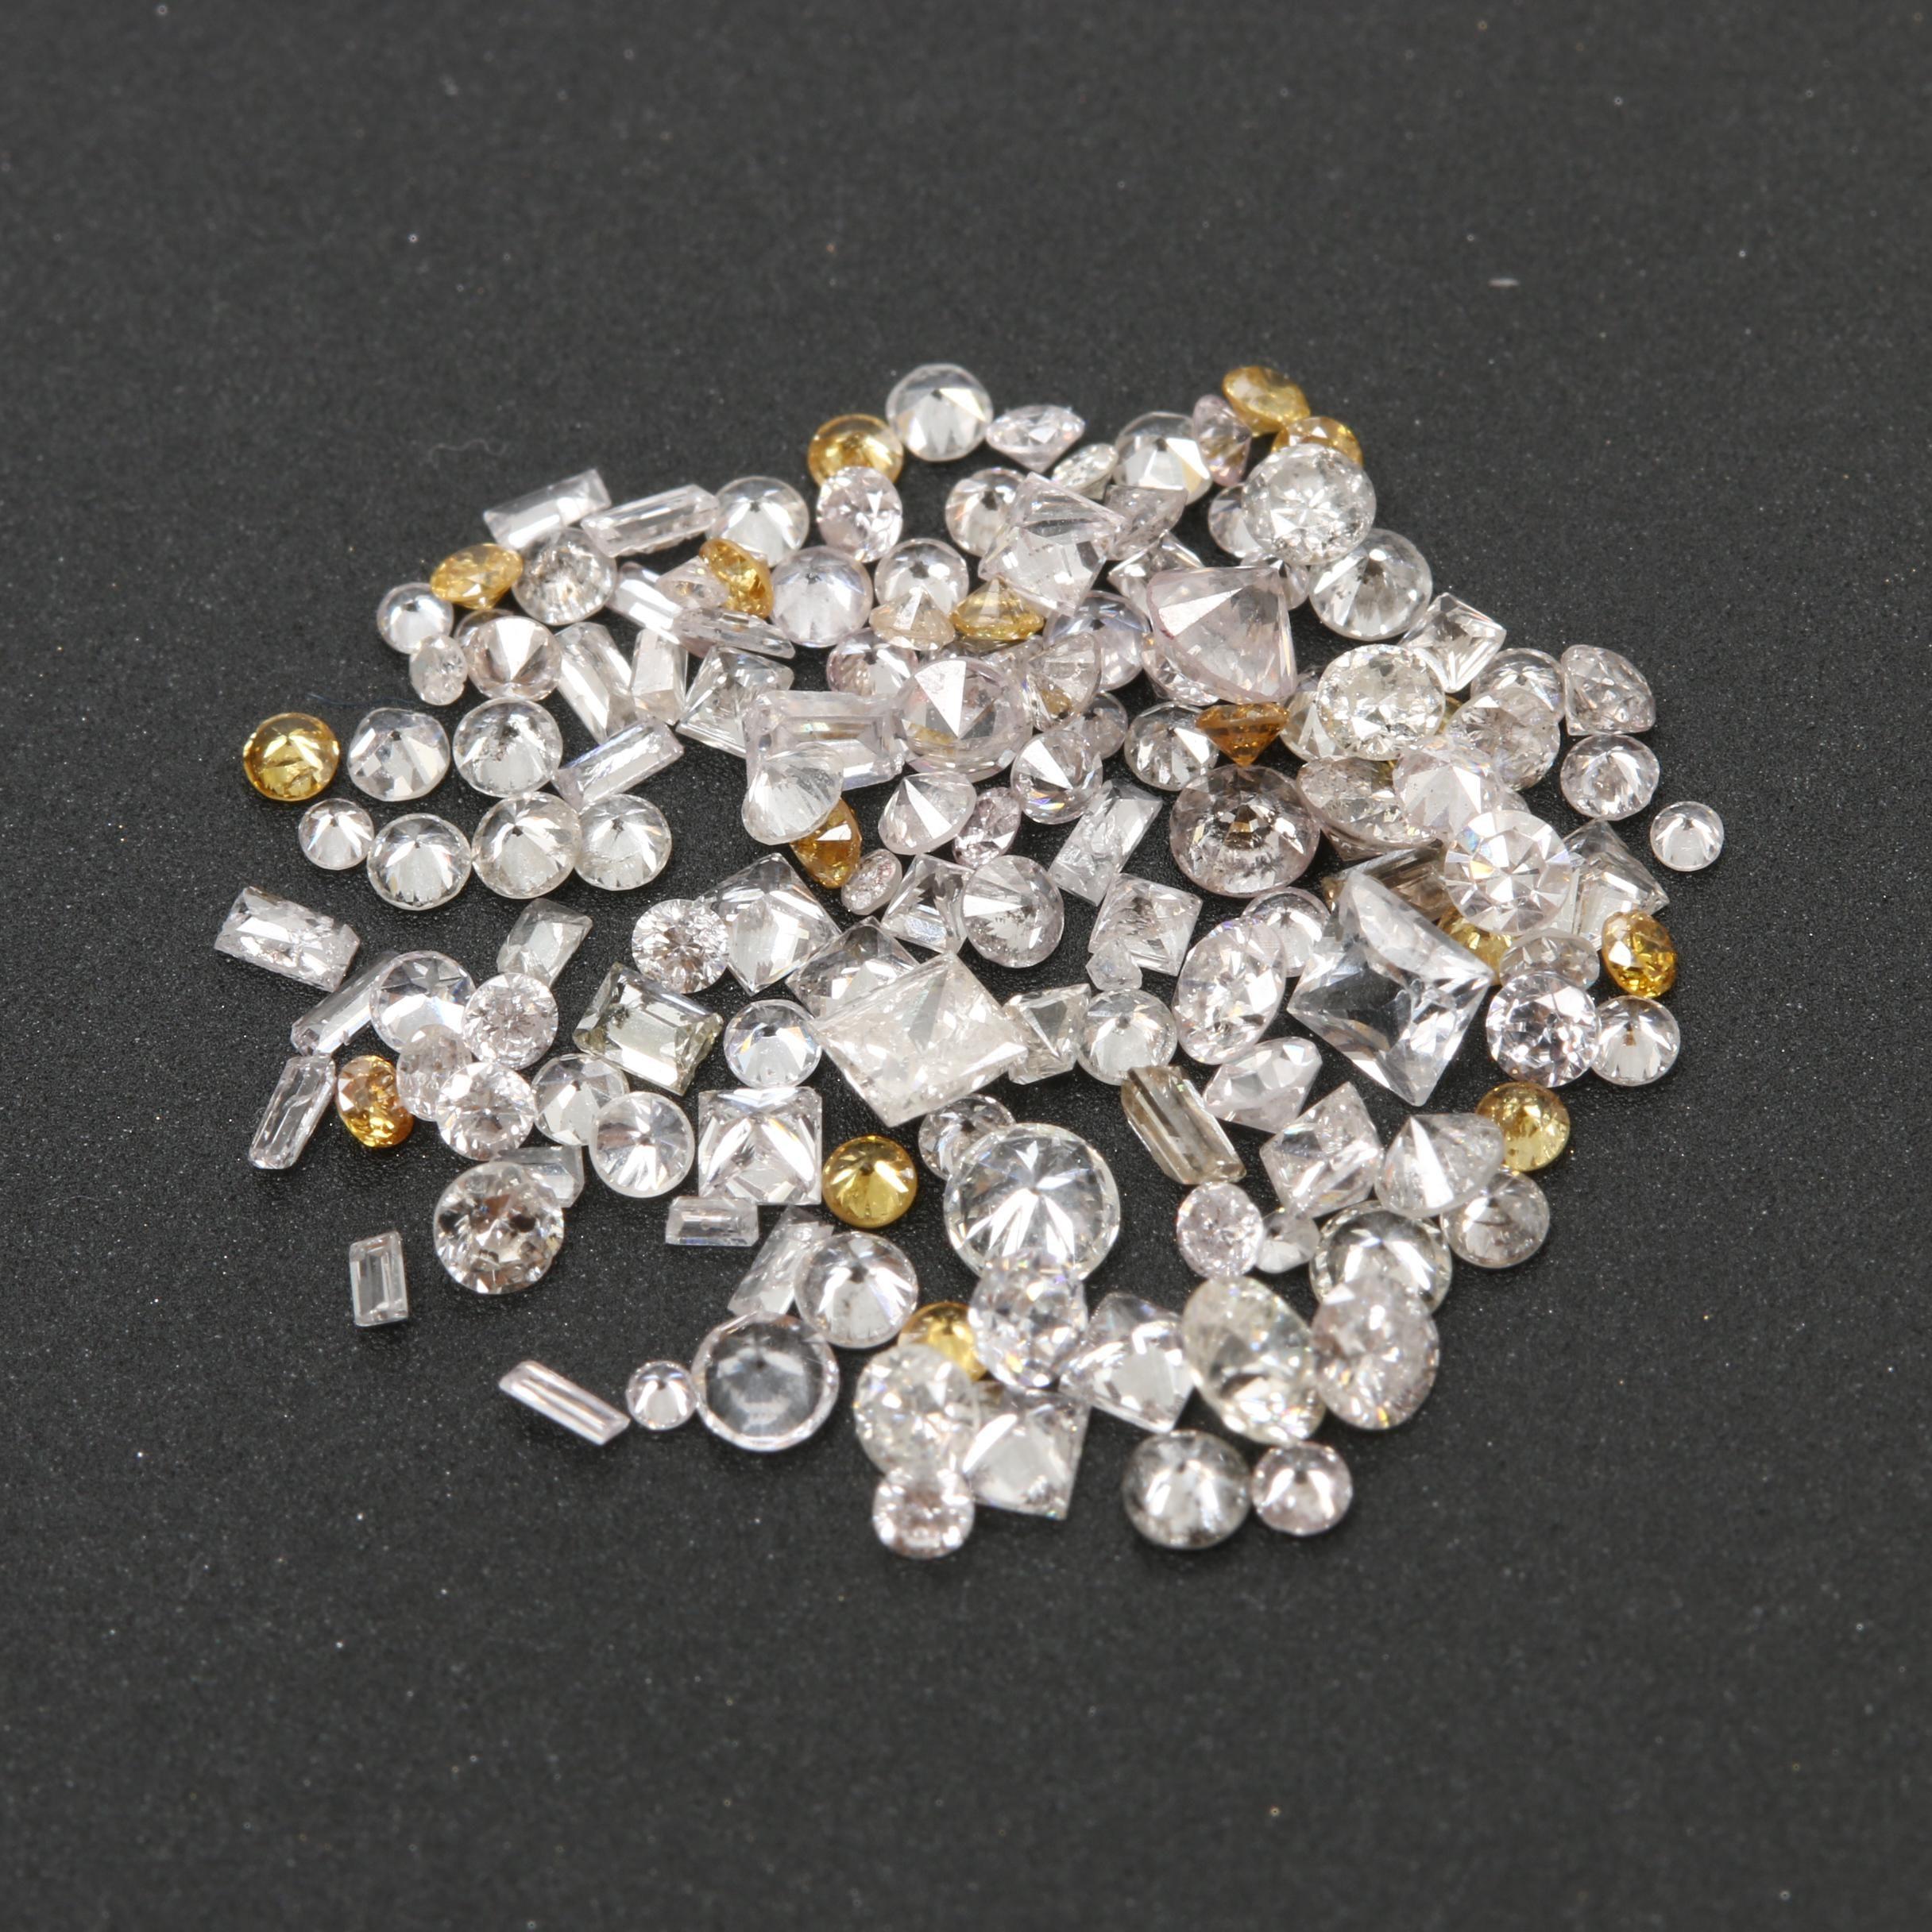 Loose 2.04 CTW Diamonds